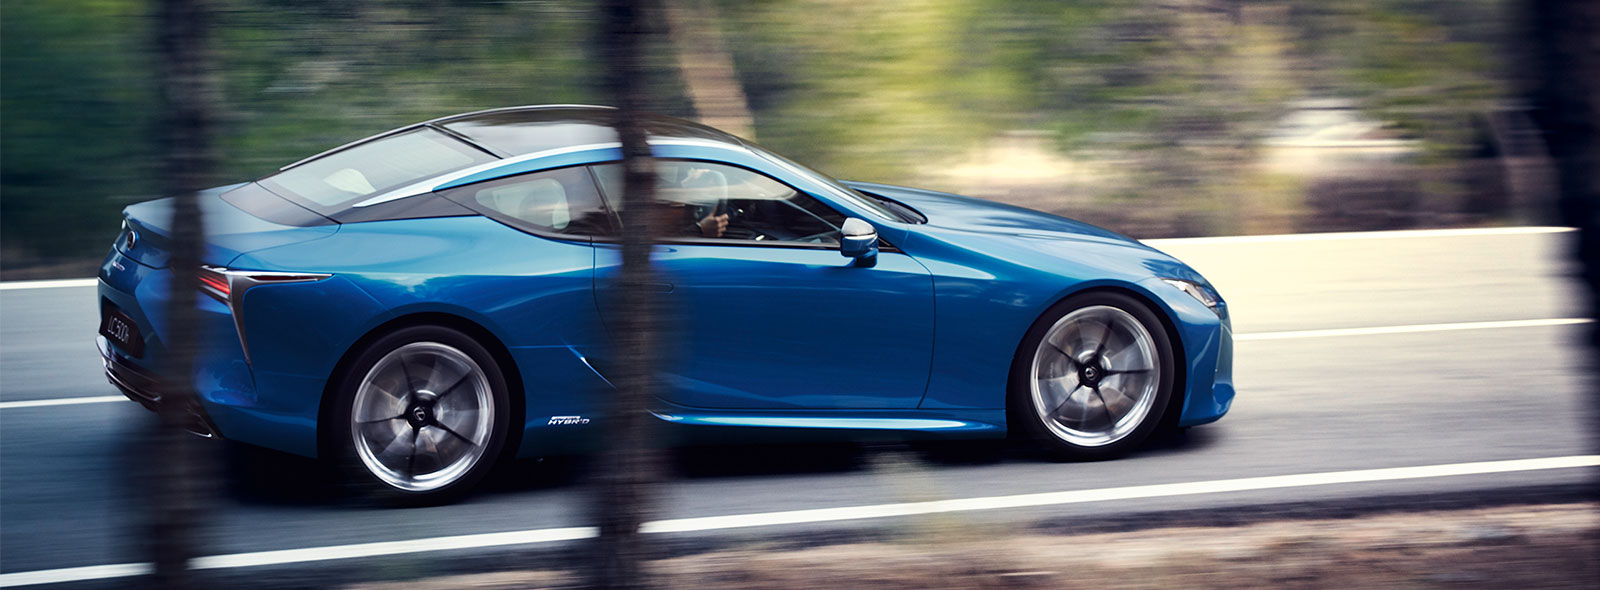 2017 Lexus LC 500h Driving Gallery 007